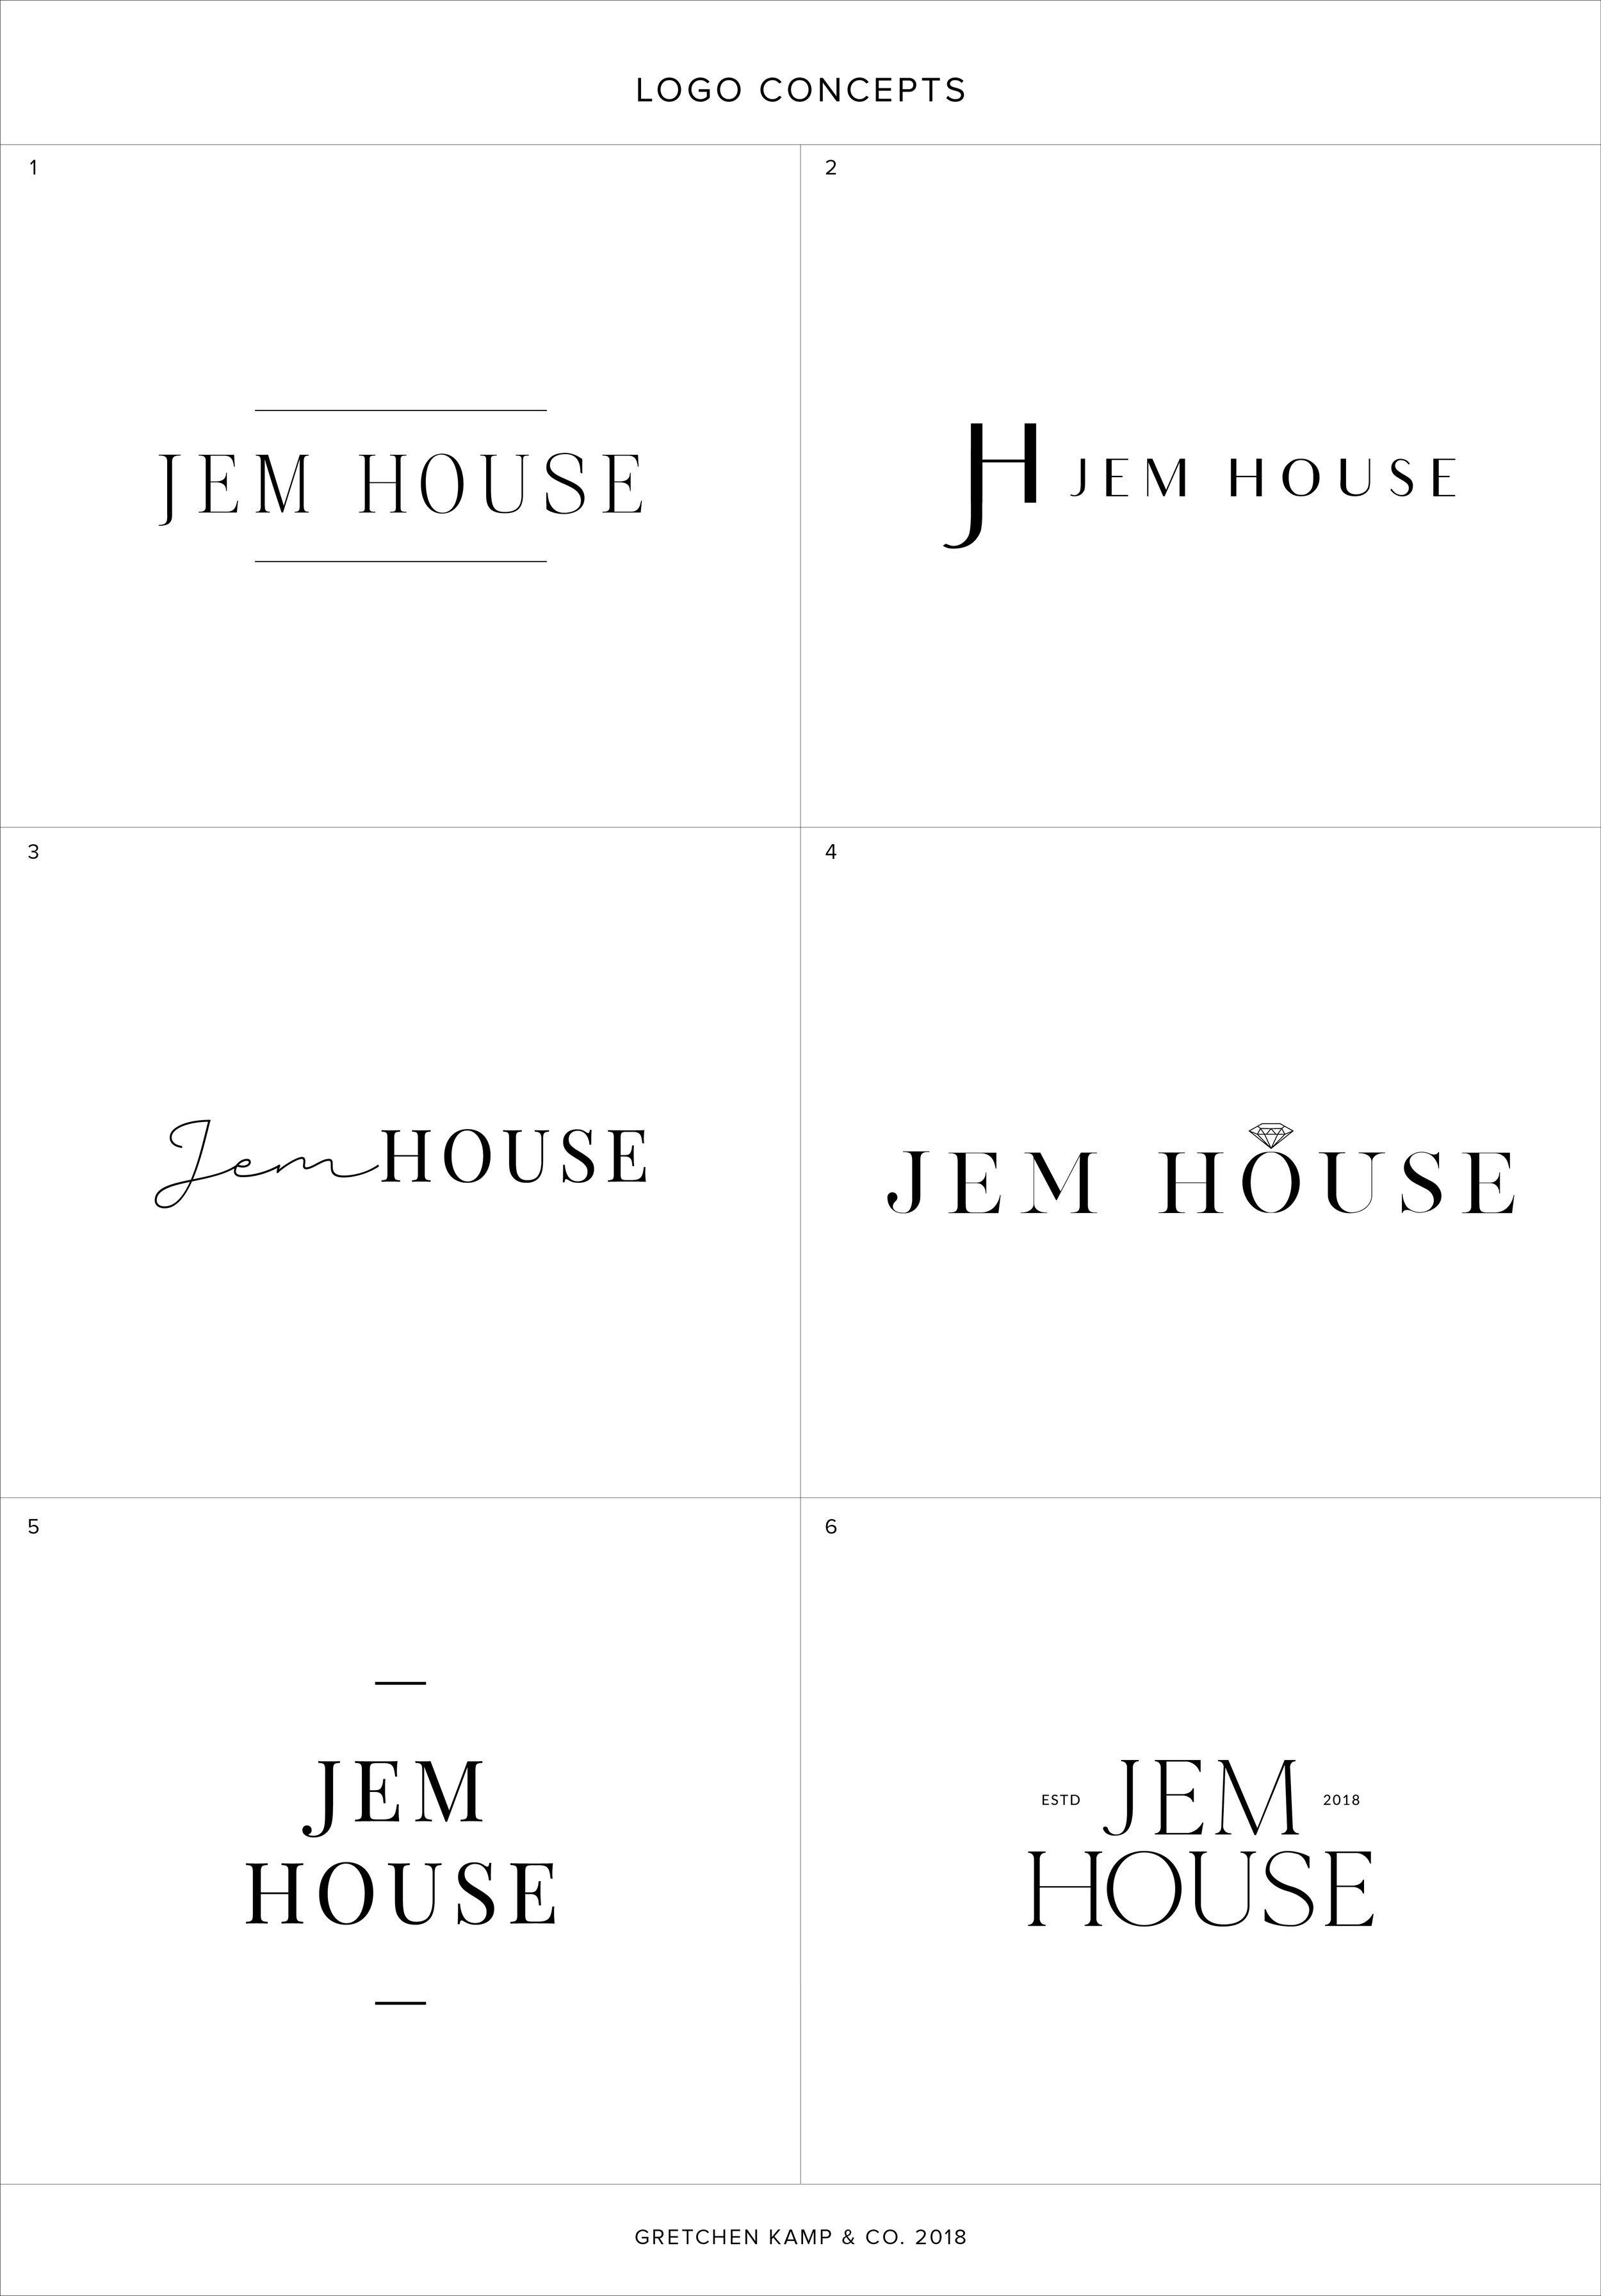 Jem House Logos by Gretchen Kamp